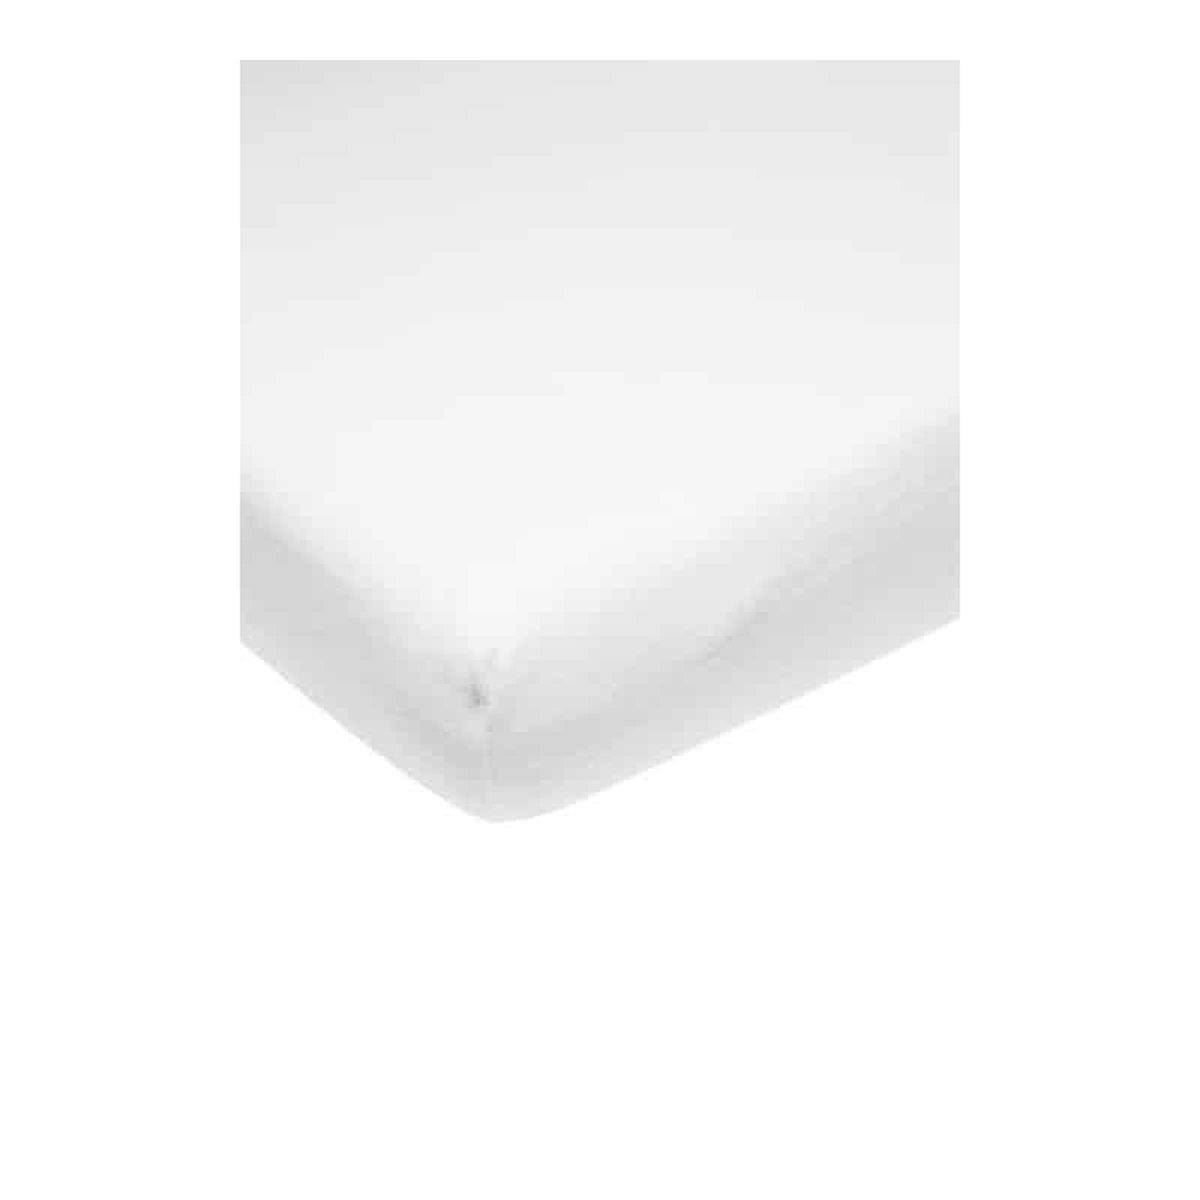 Meyco molton stretch hoeslaken co-sleeper - 50x90 cm - wit